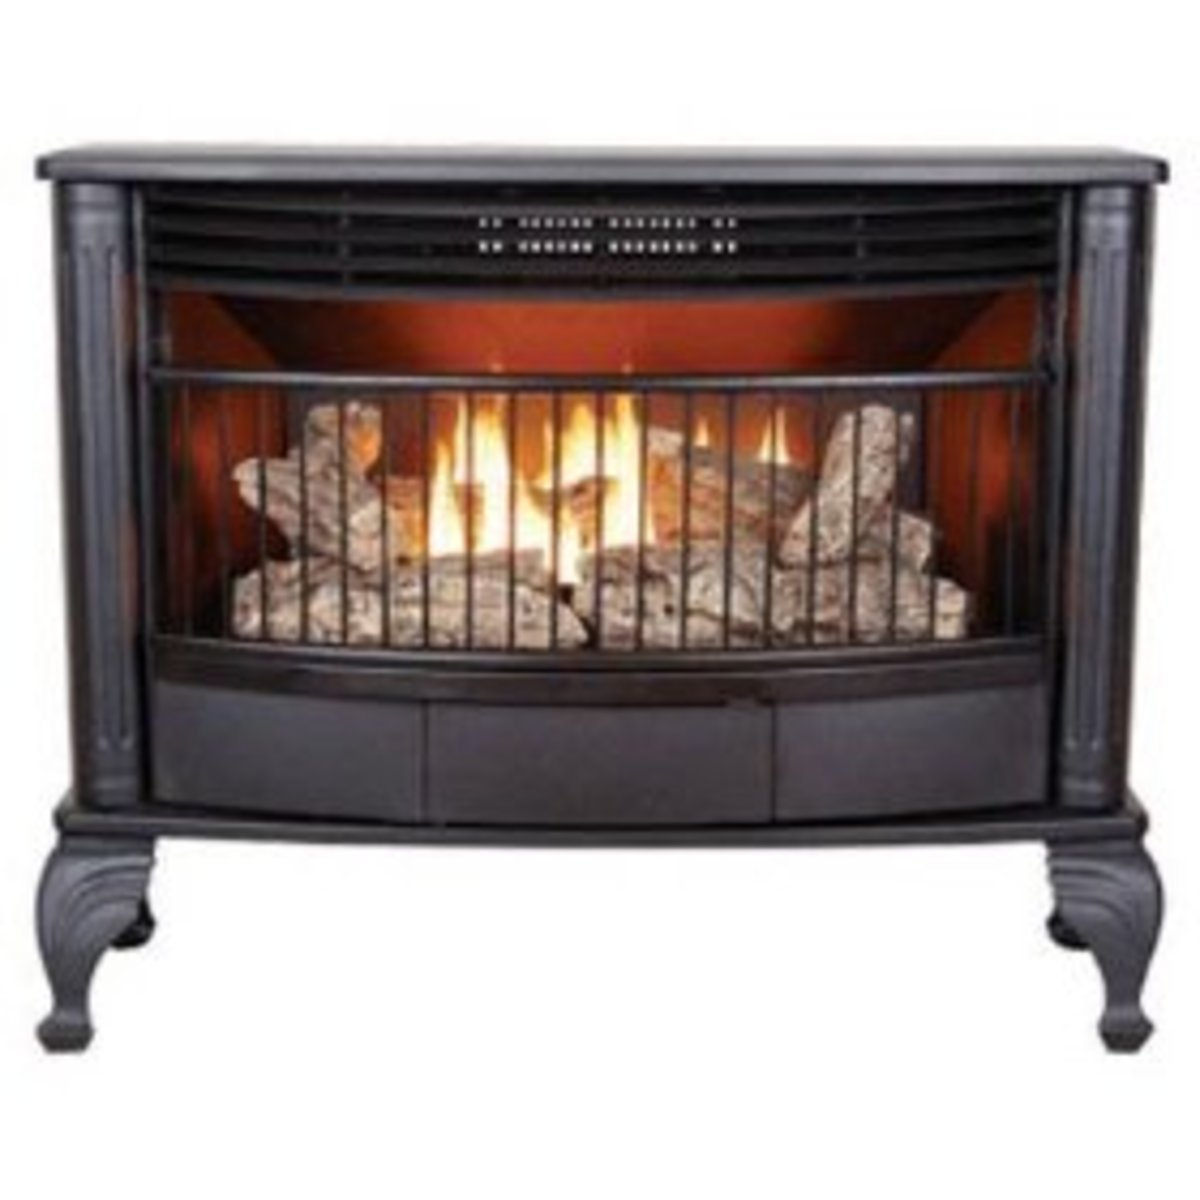 Indoor Propane Fireplace - TheFirePlace